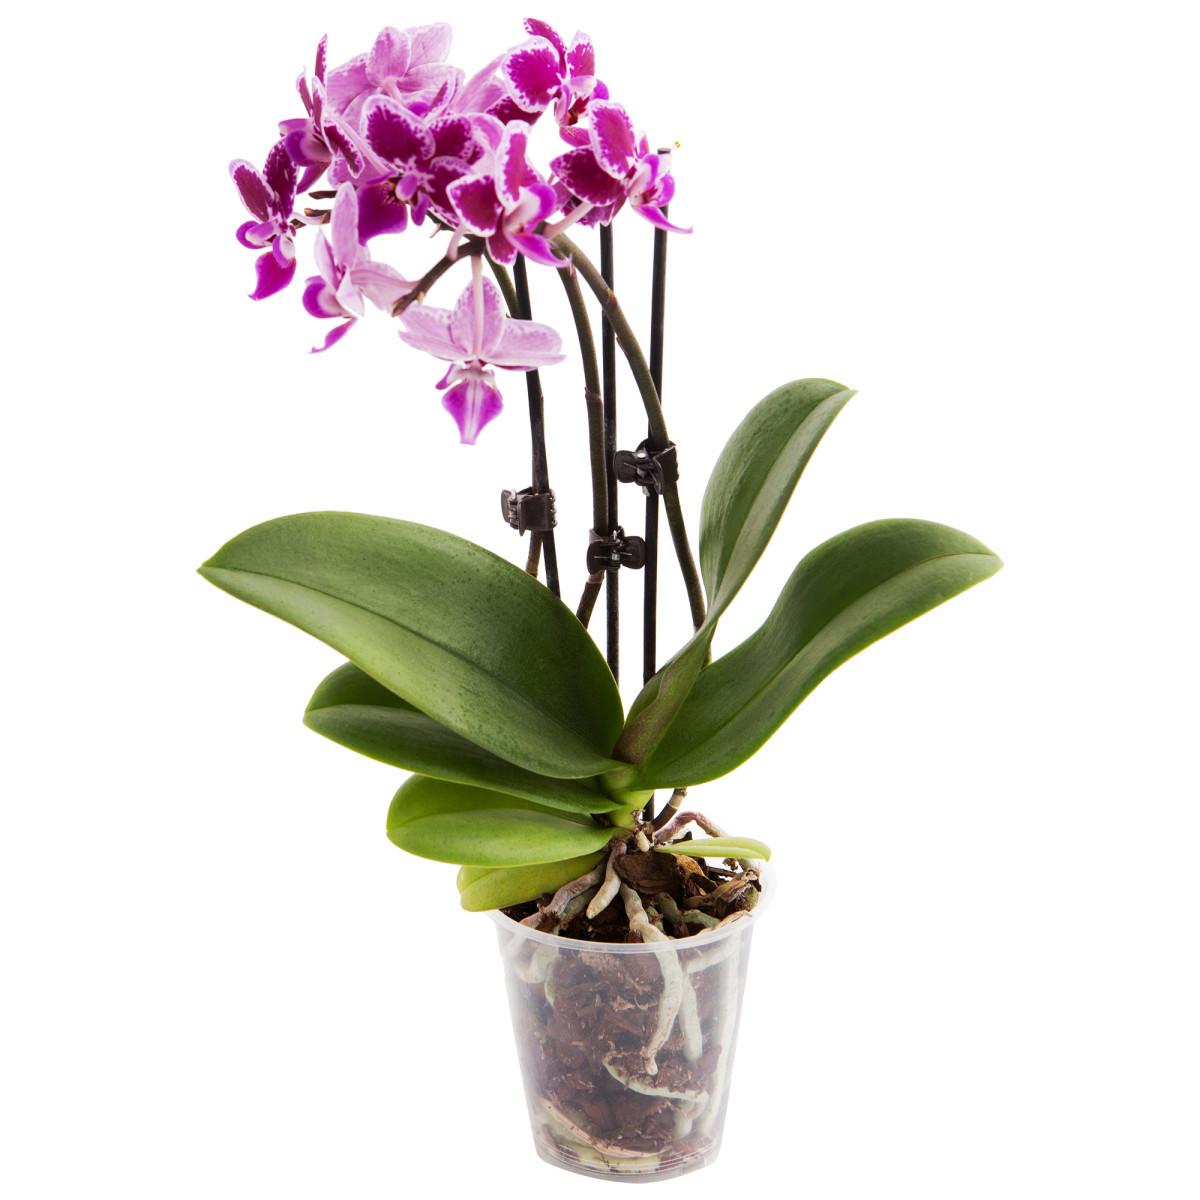 орхидея парфюм тула каталог товаров цены